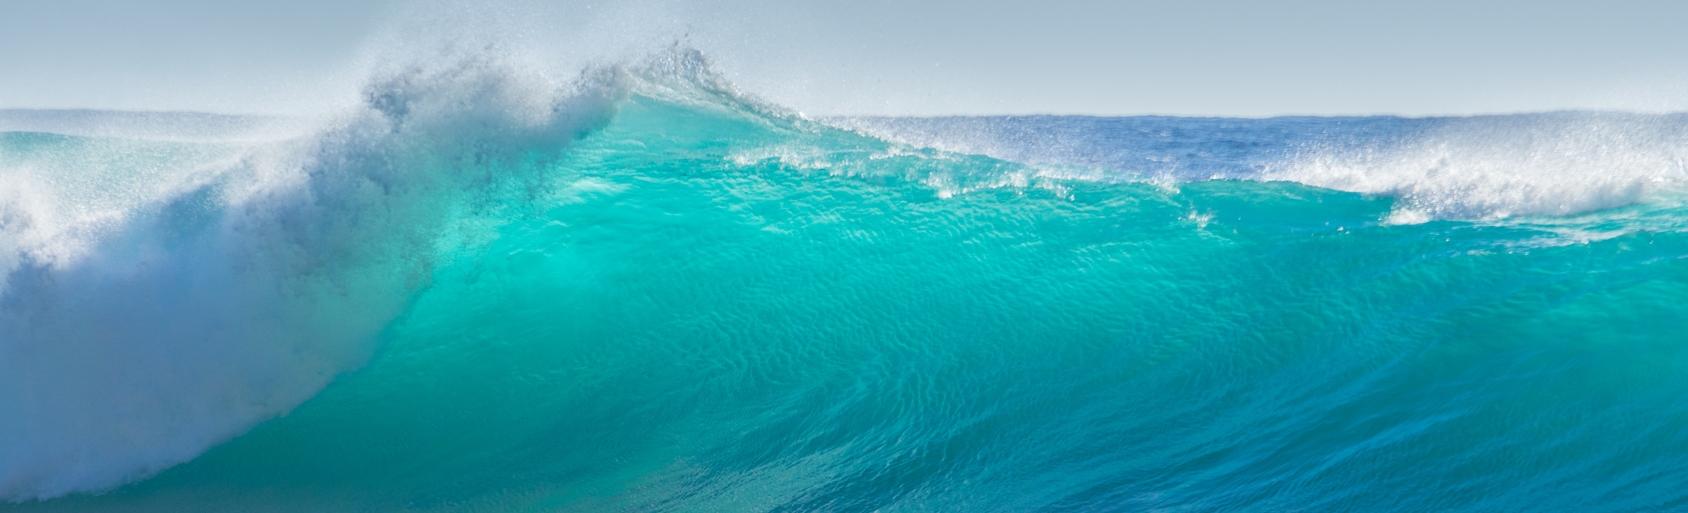 big breaking turquoise ocean wave